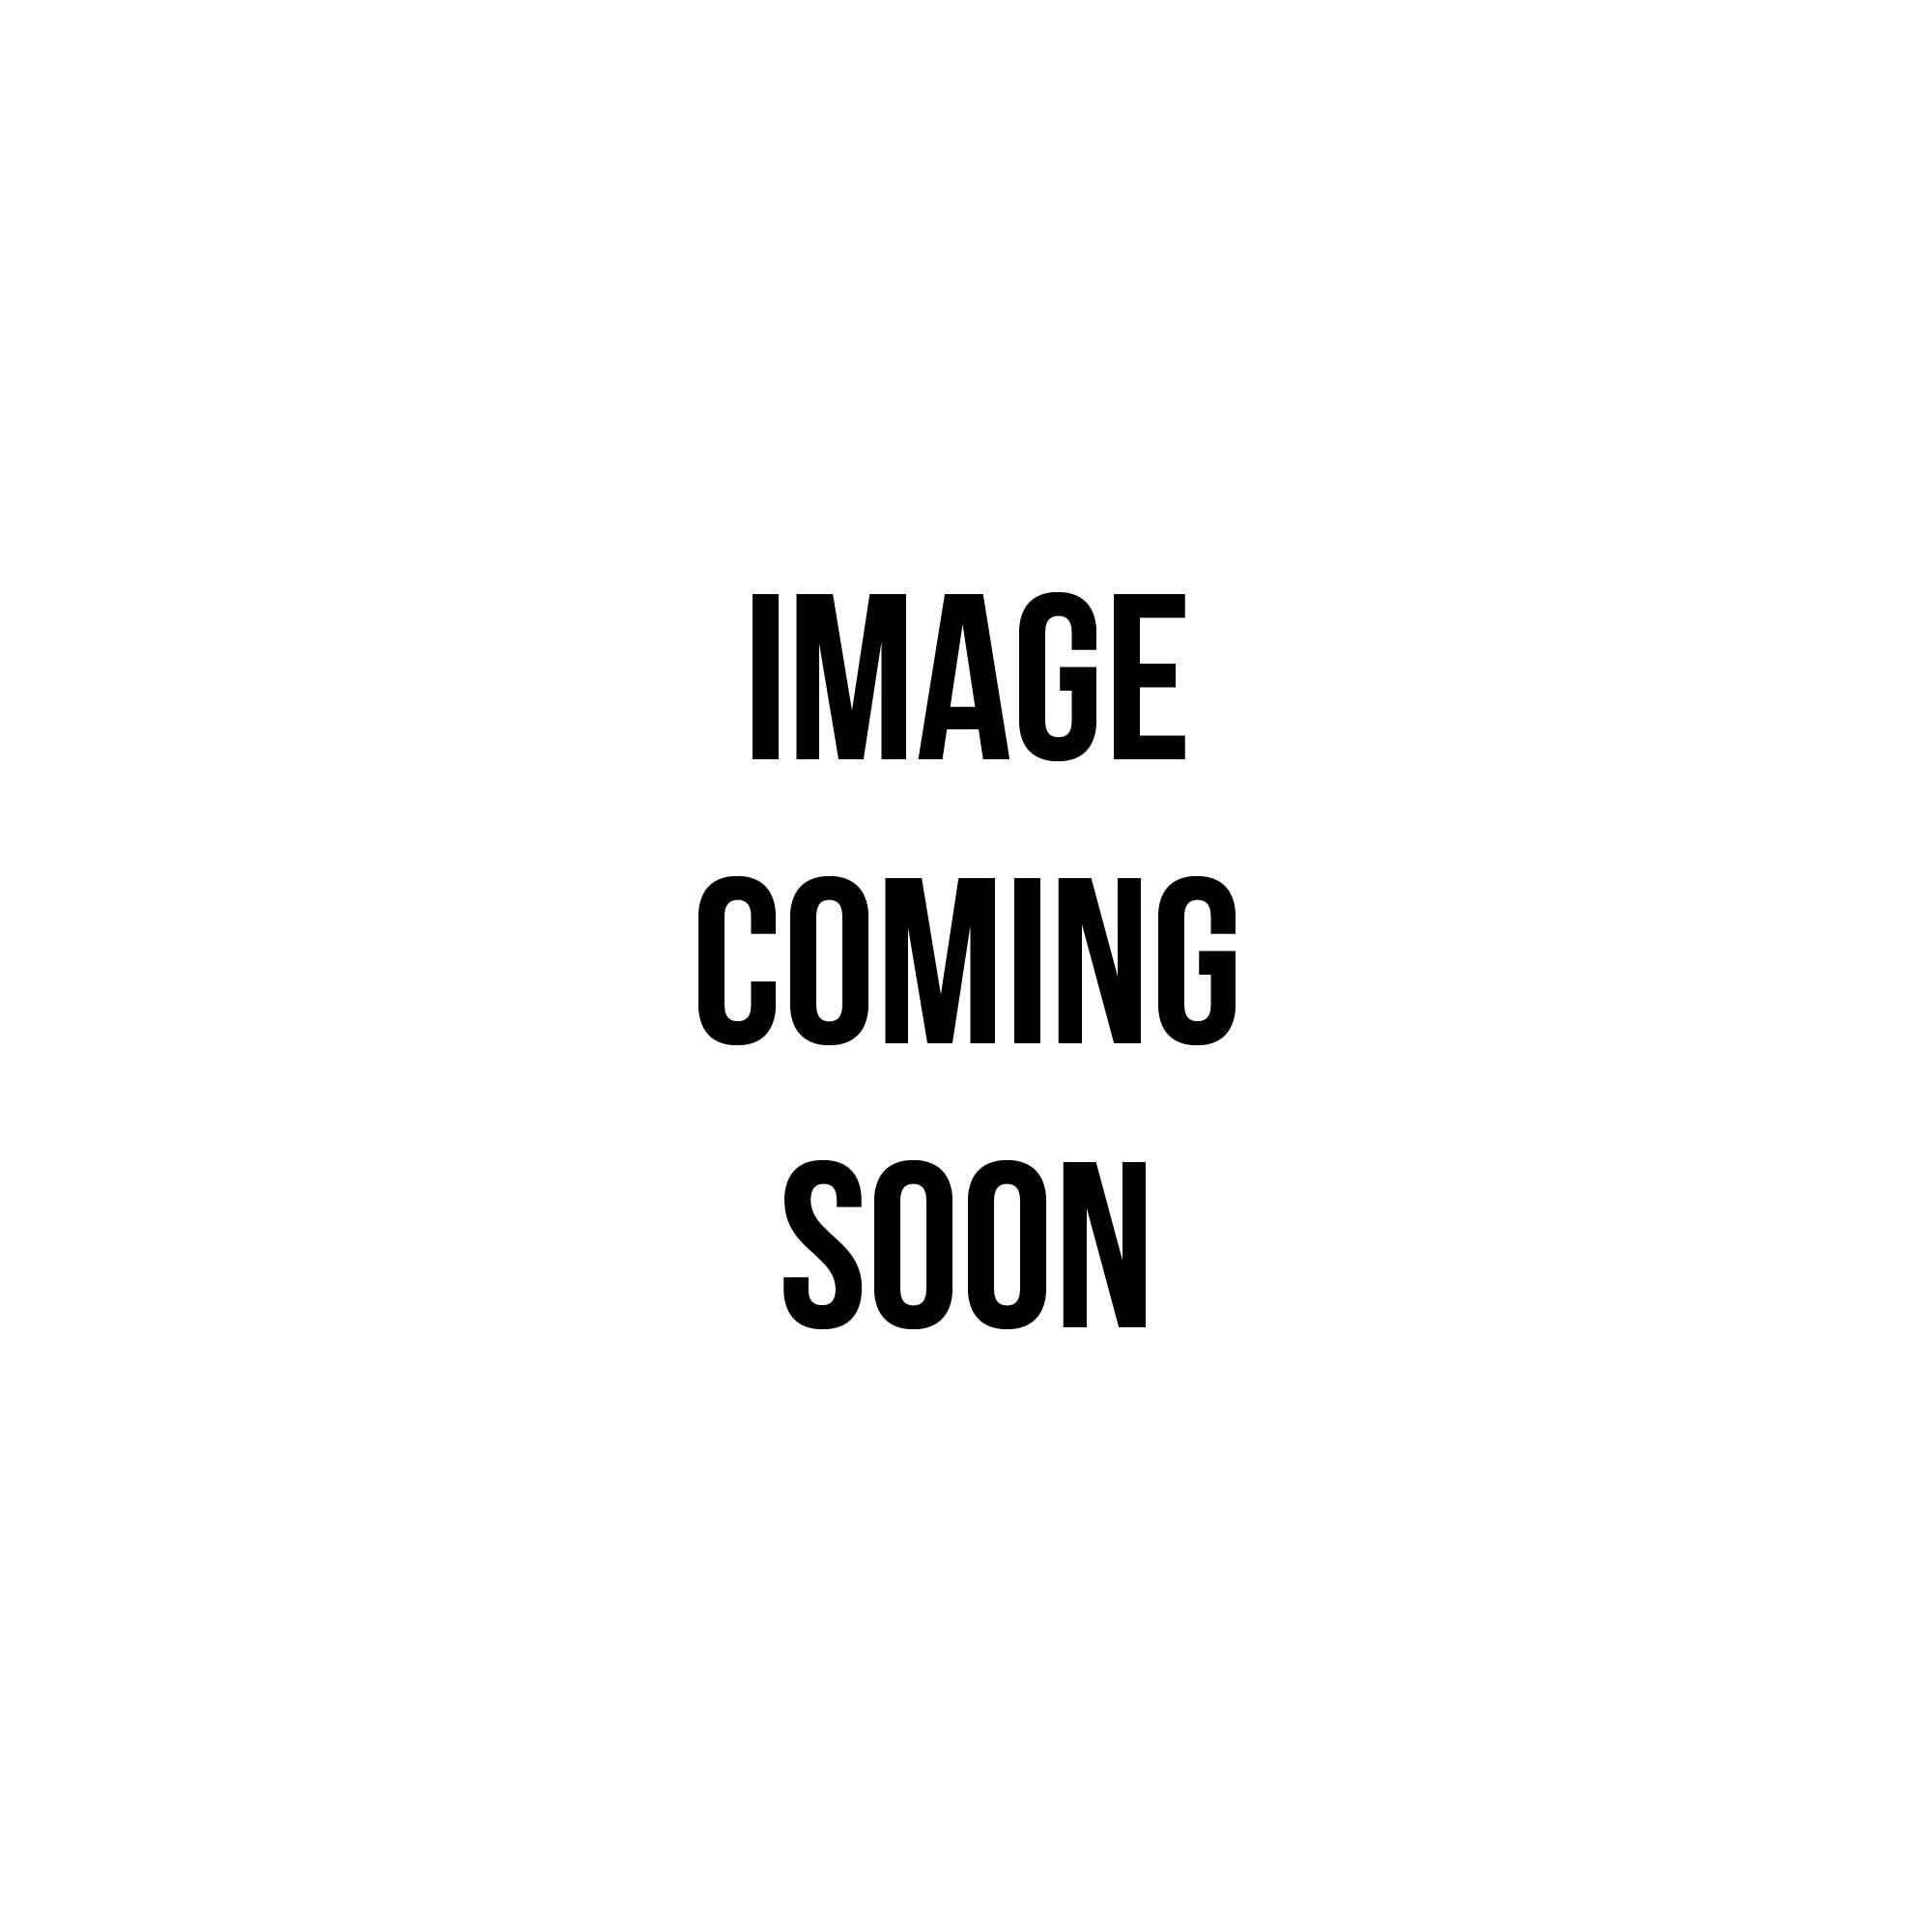 vente grande remise vente grande vente Nike Libre Rn Flyknit 2017 Noir / Volt / Blanc 2014 unisexe incroyable ykm83hsY